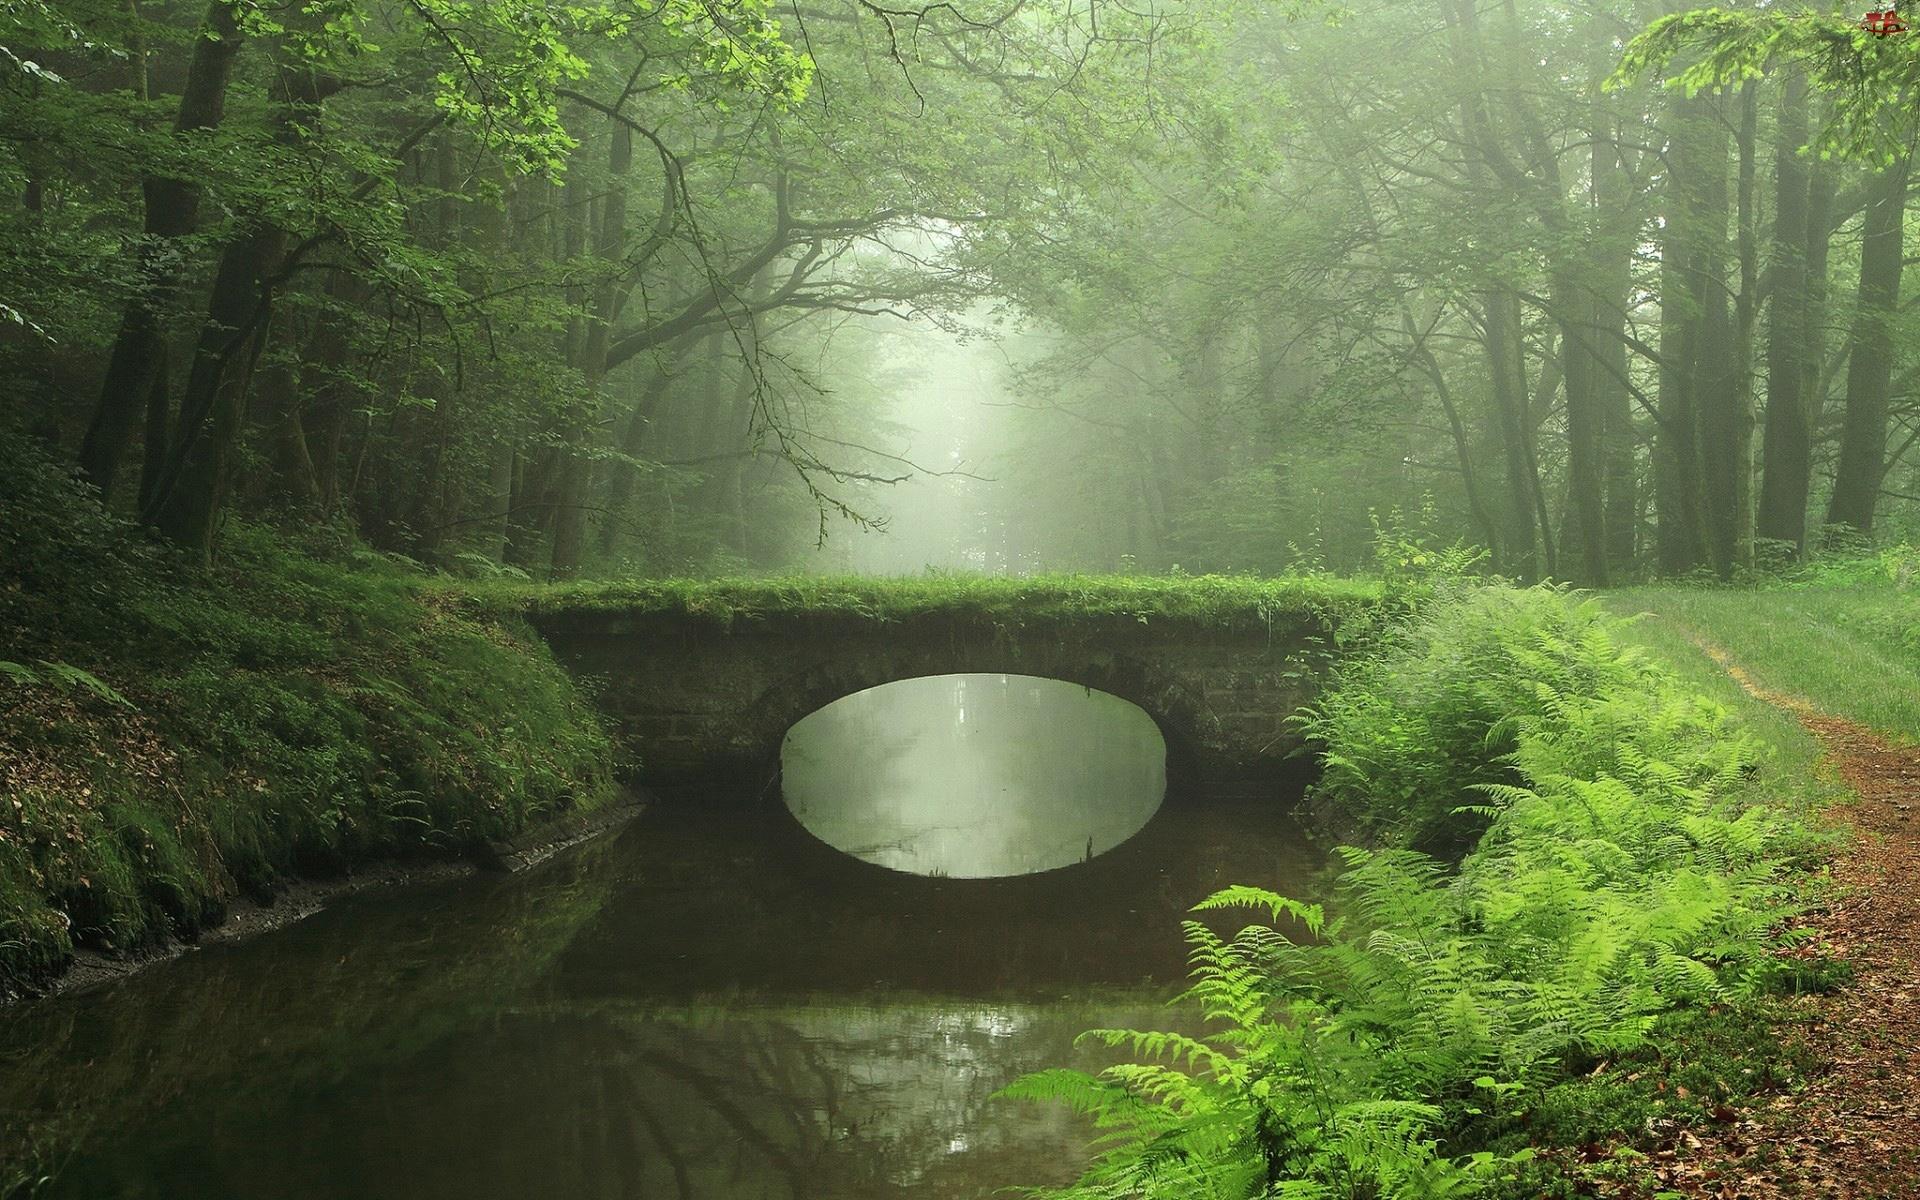 Paprocie, Rzeka, Most, Las, Mgła